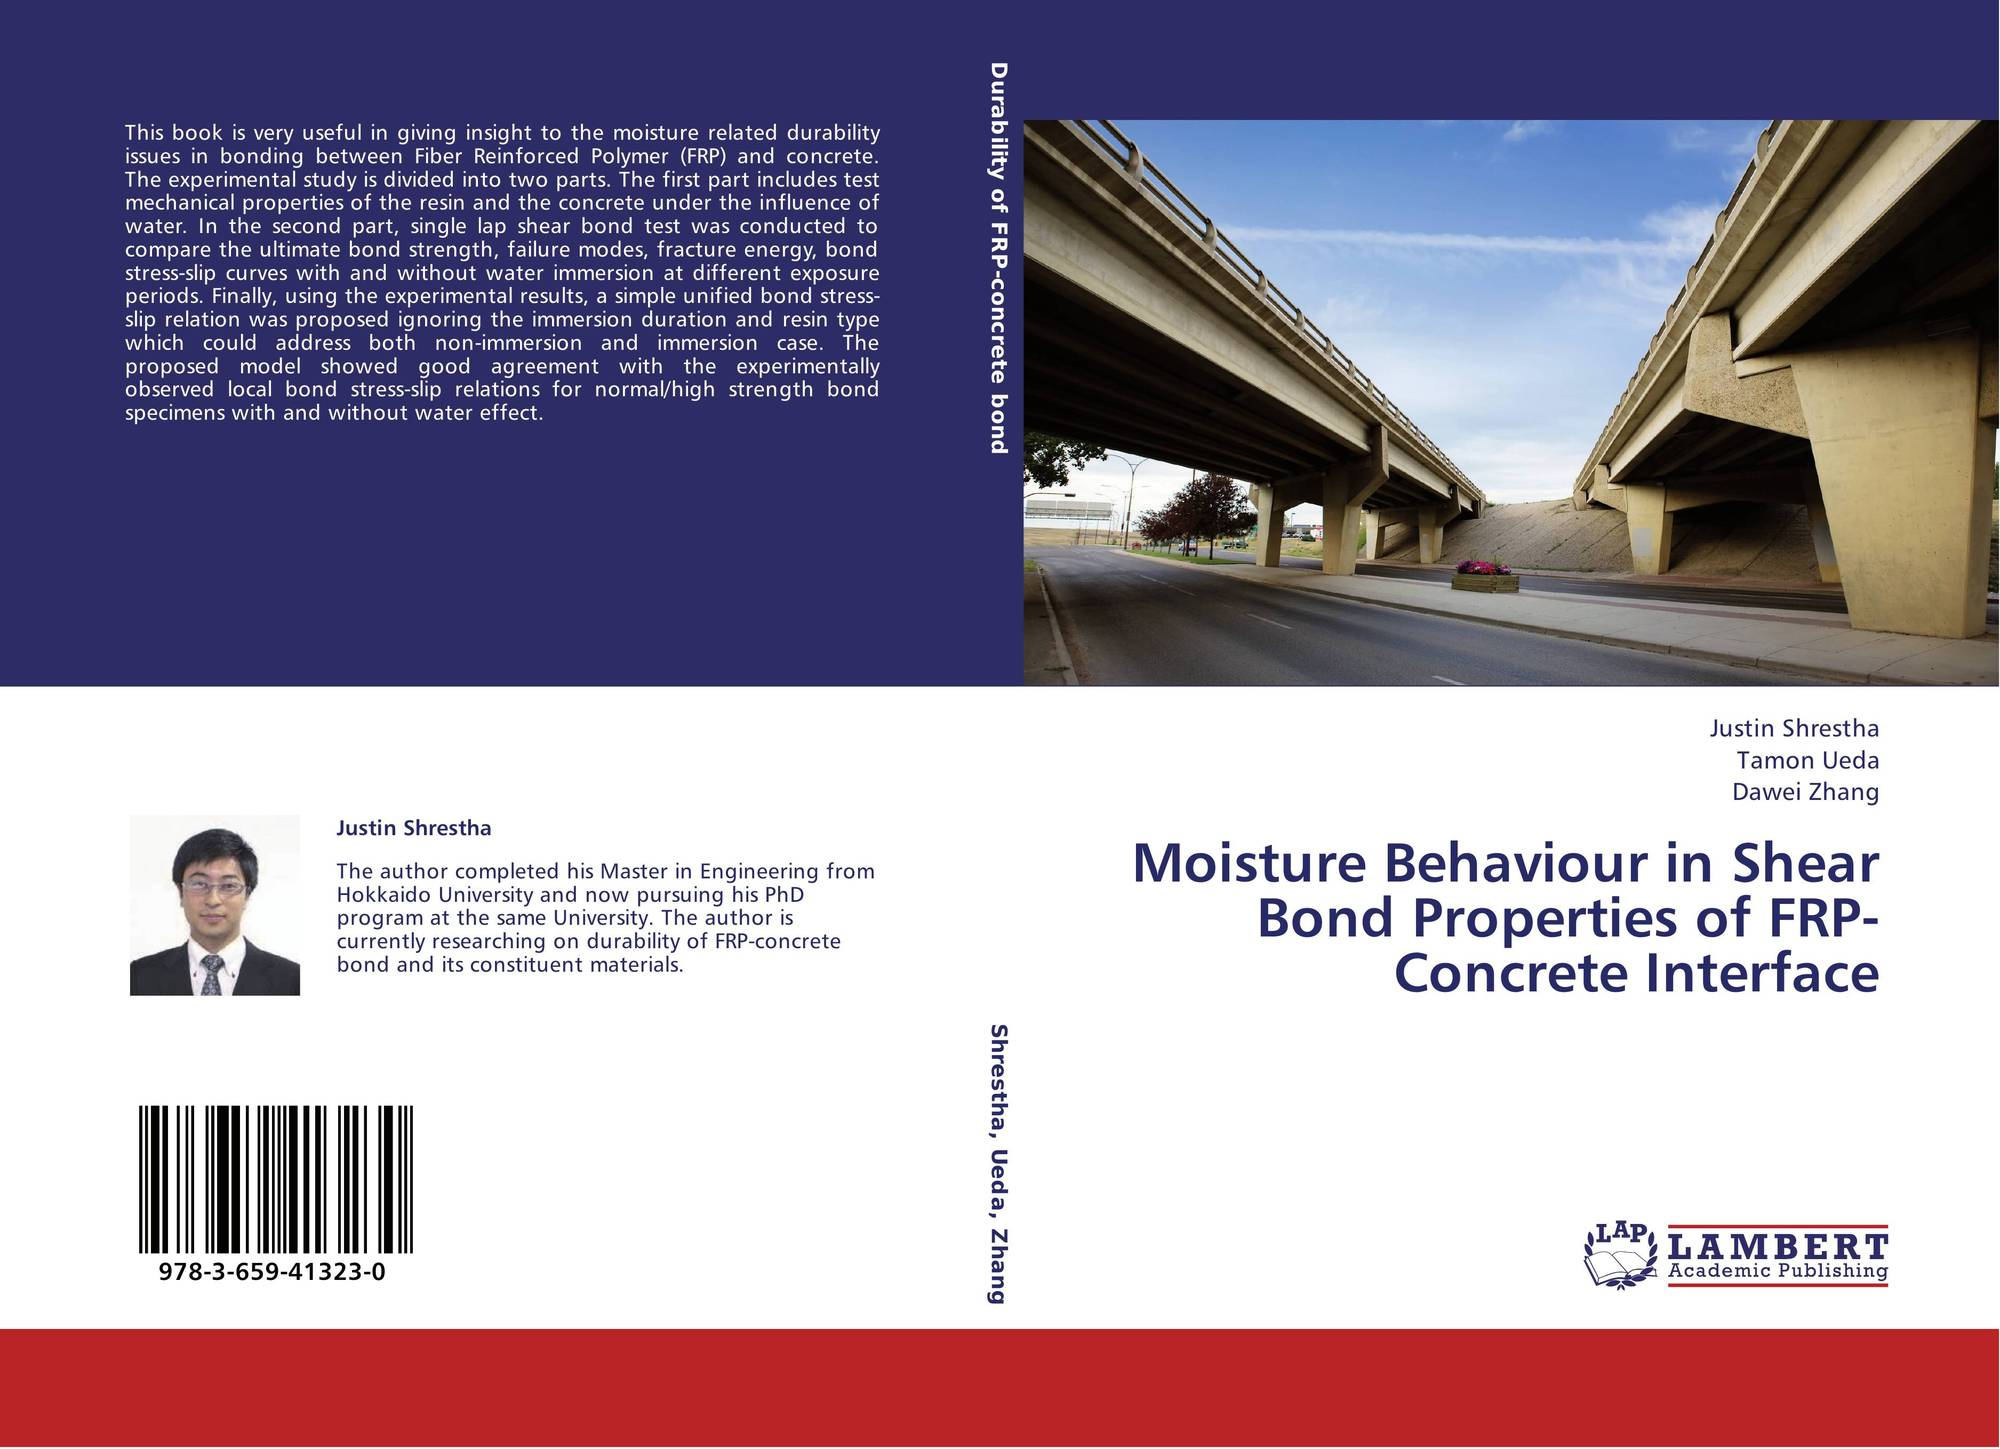 Moisture Behaviour in Shear Bond Properties of FRP-Concrete